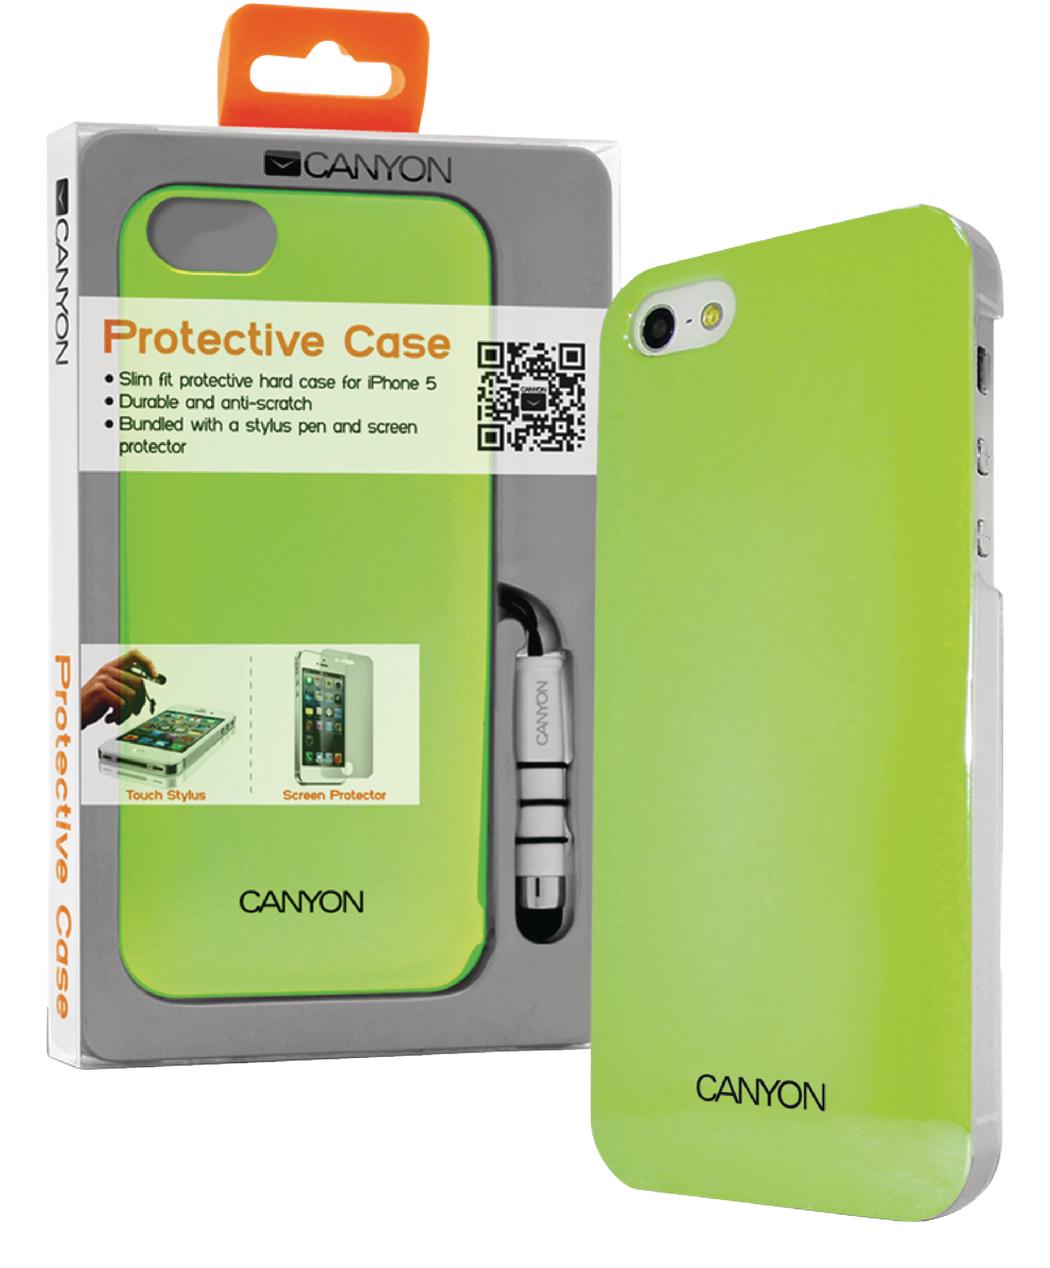 Canyon Cna-i5c03g Iphone 5 Hard Cover Case met Stylus en Screen Protector Groentinten